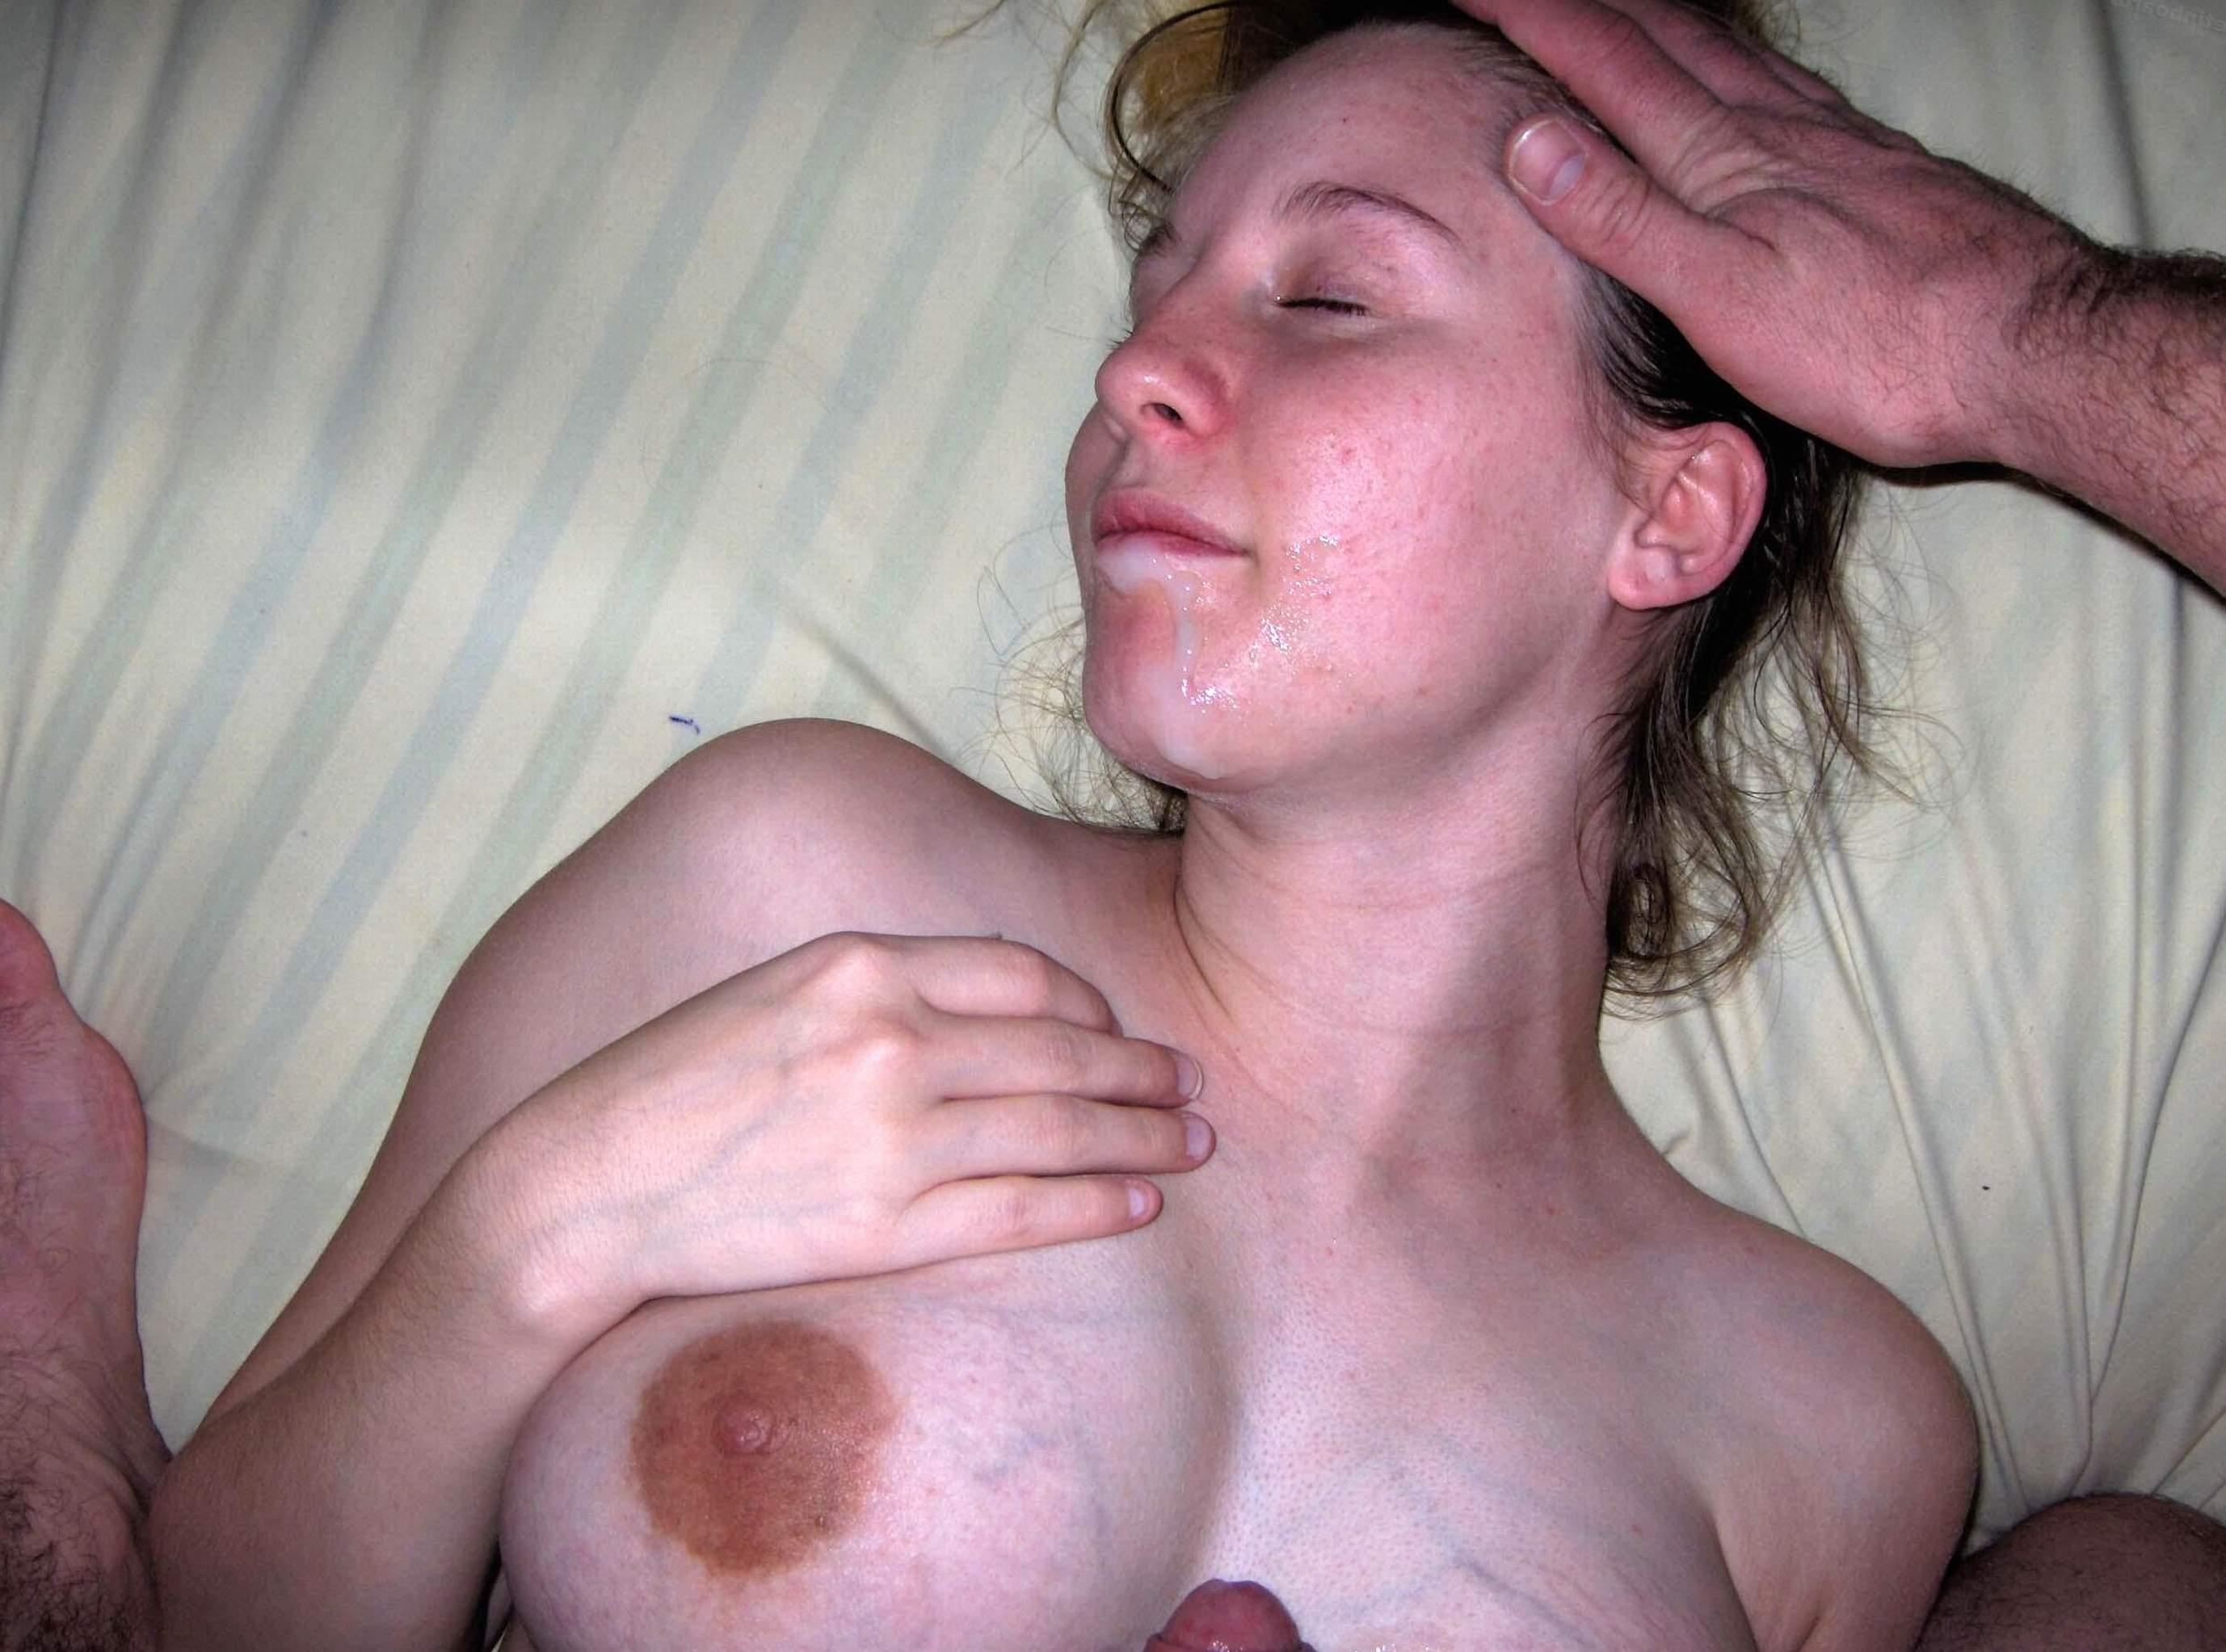 Multiple cum shot on tits